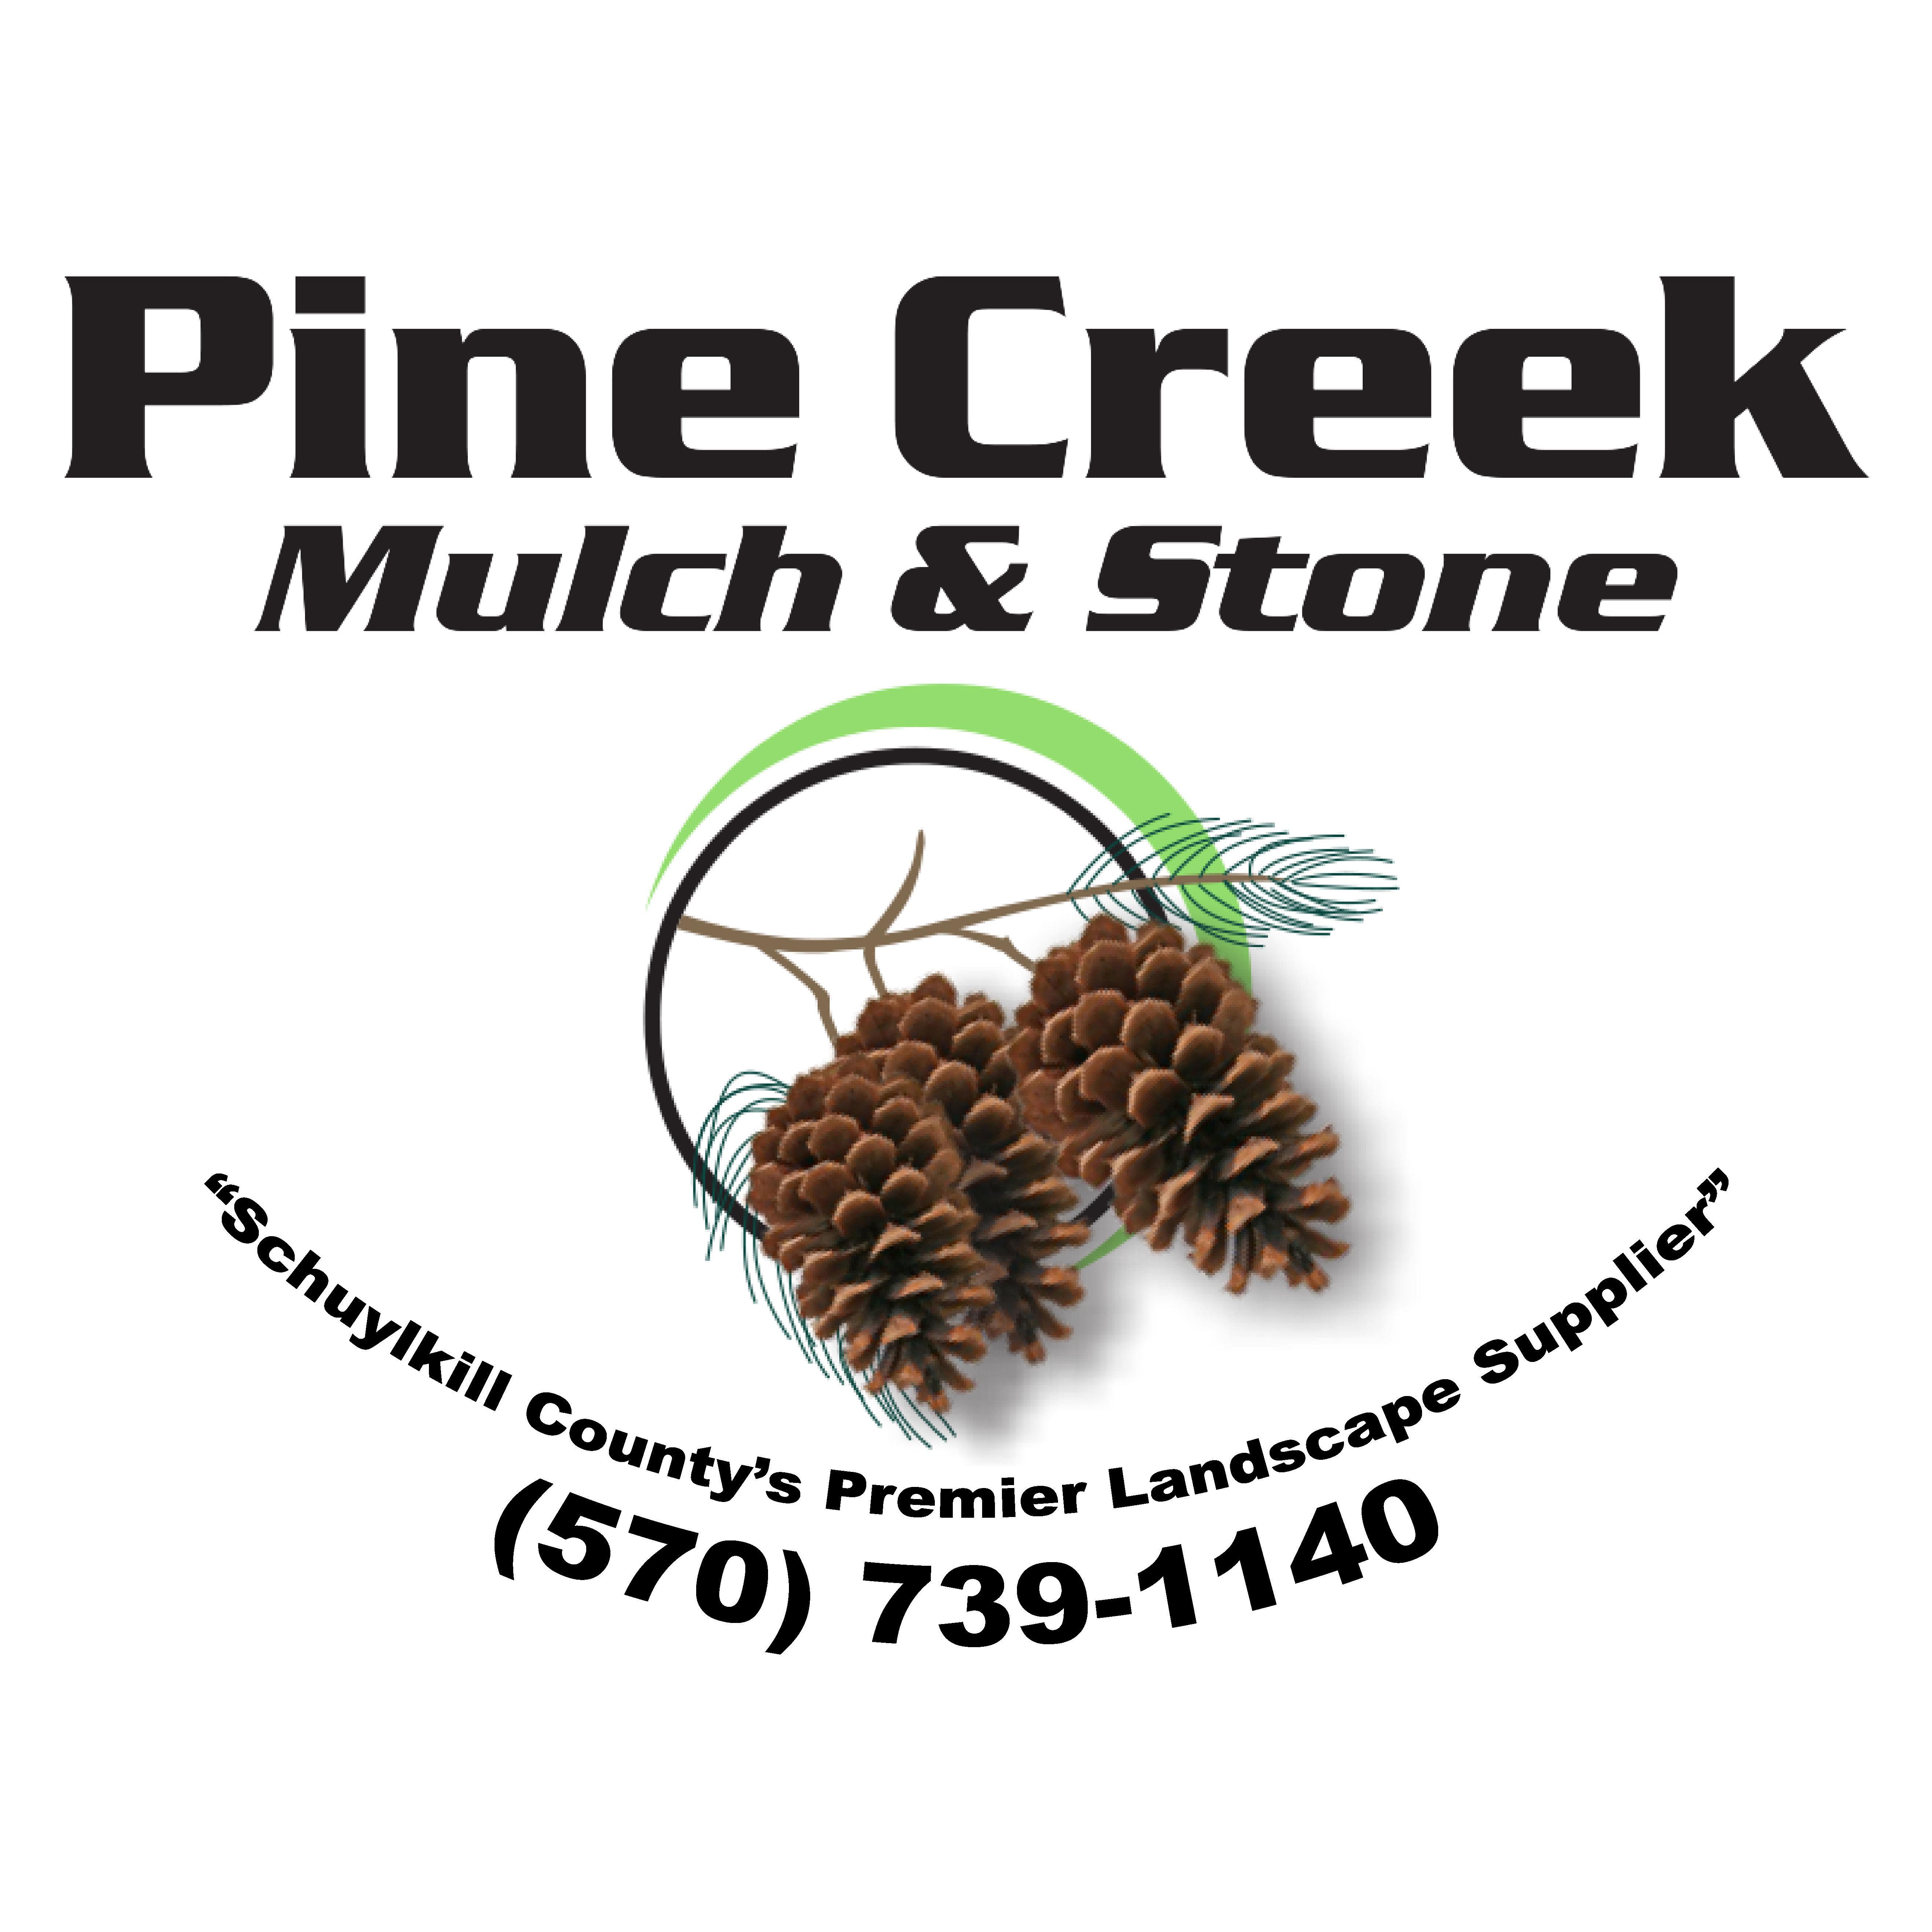 Pine Creek Mulch & Stone